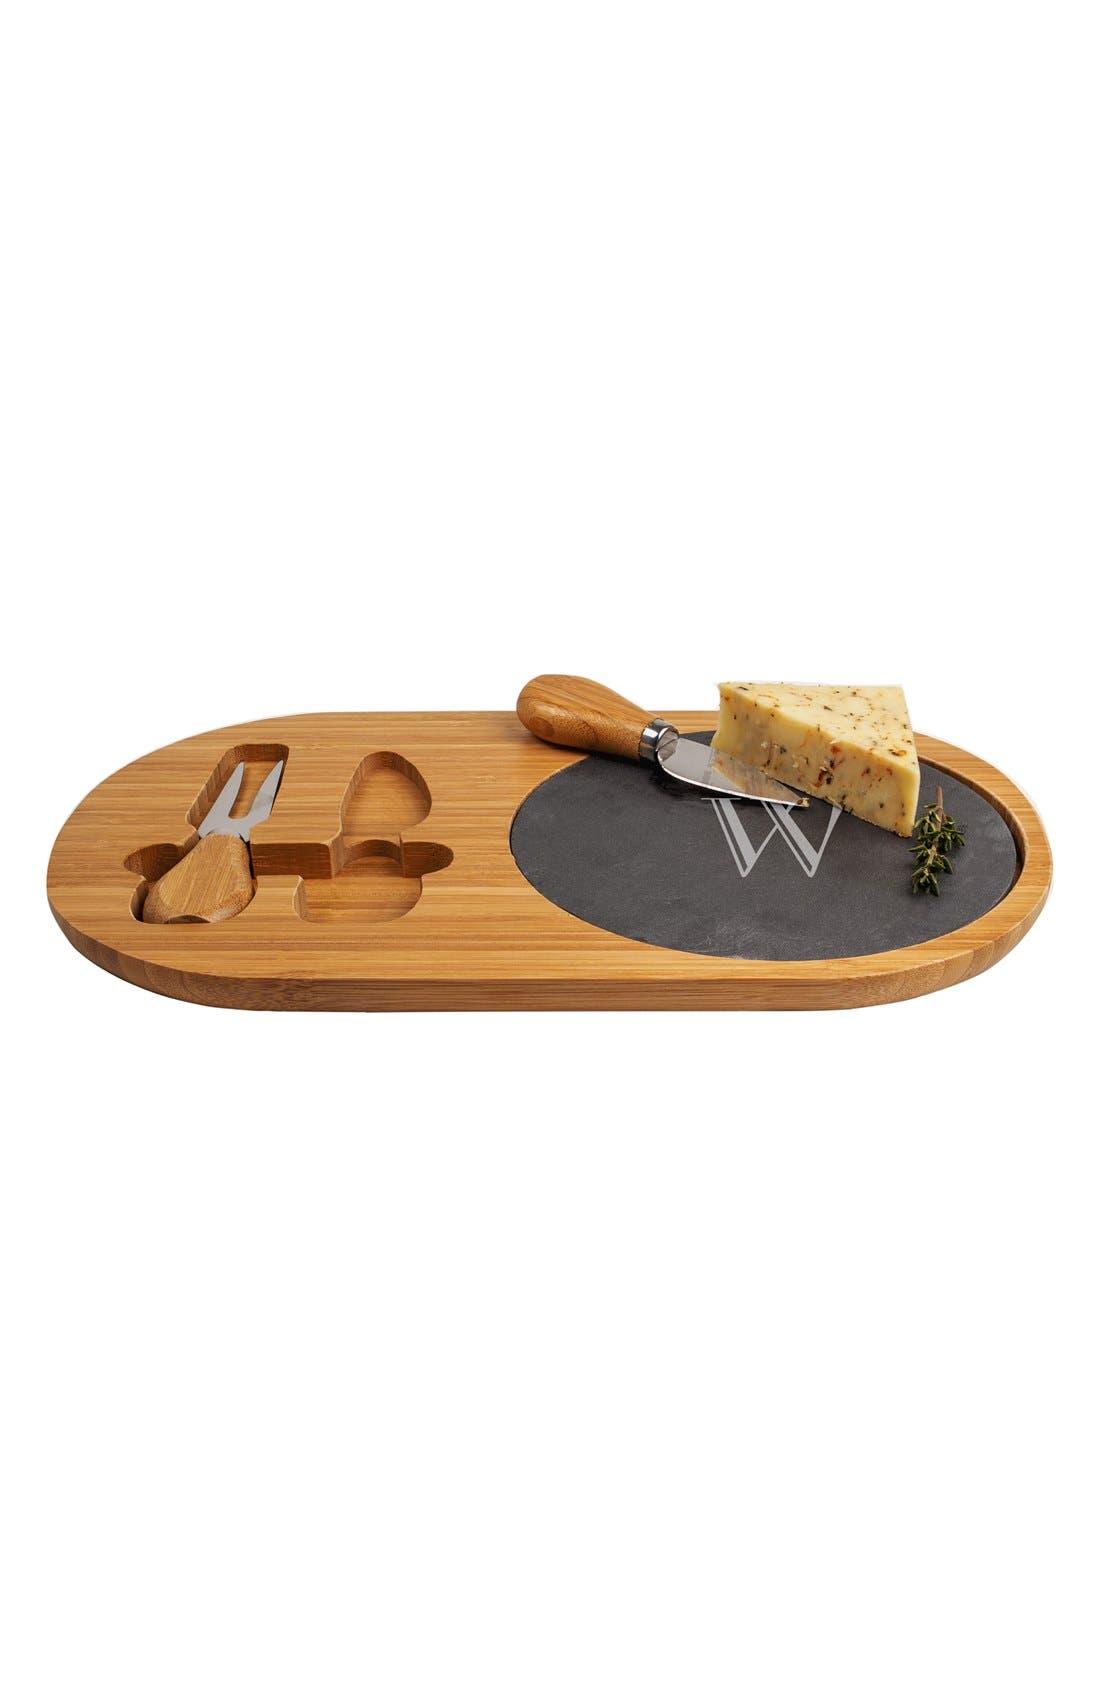 Monogram Cheese Board & Utensils,                             Alternate thumbnail 3, color,